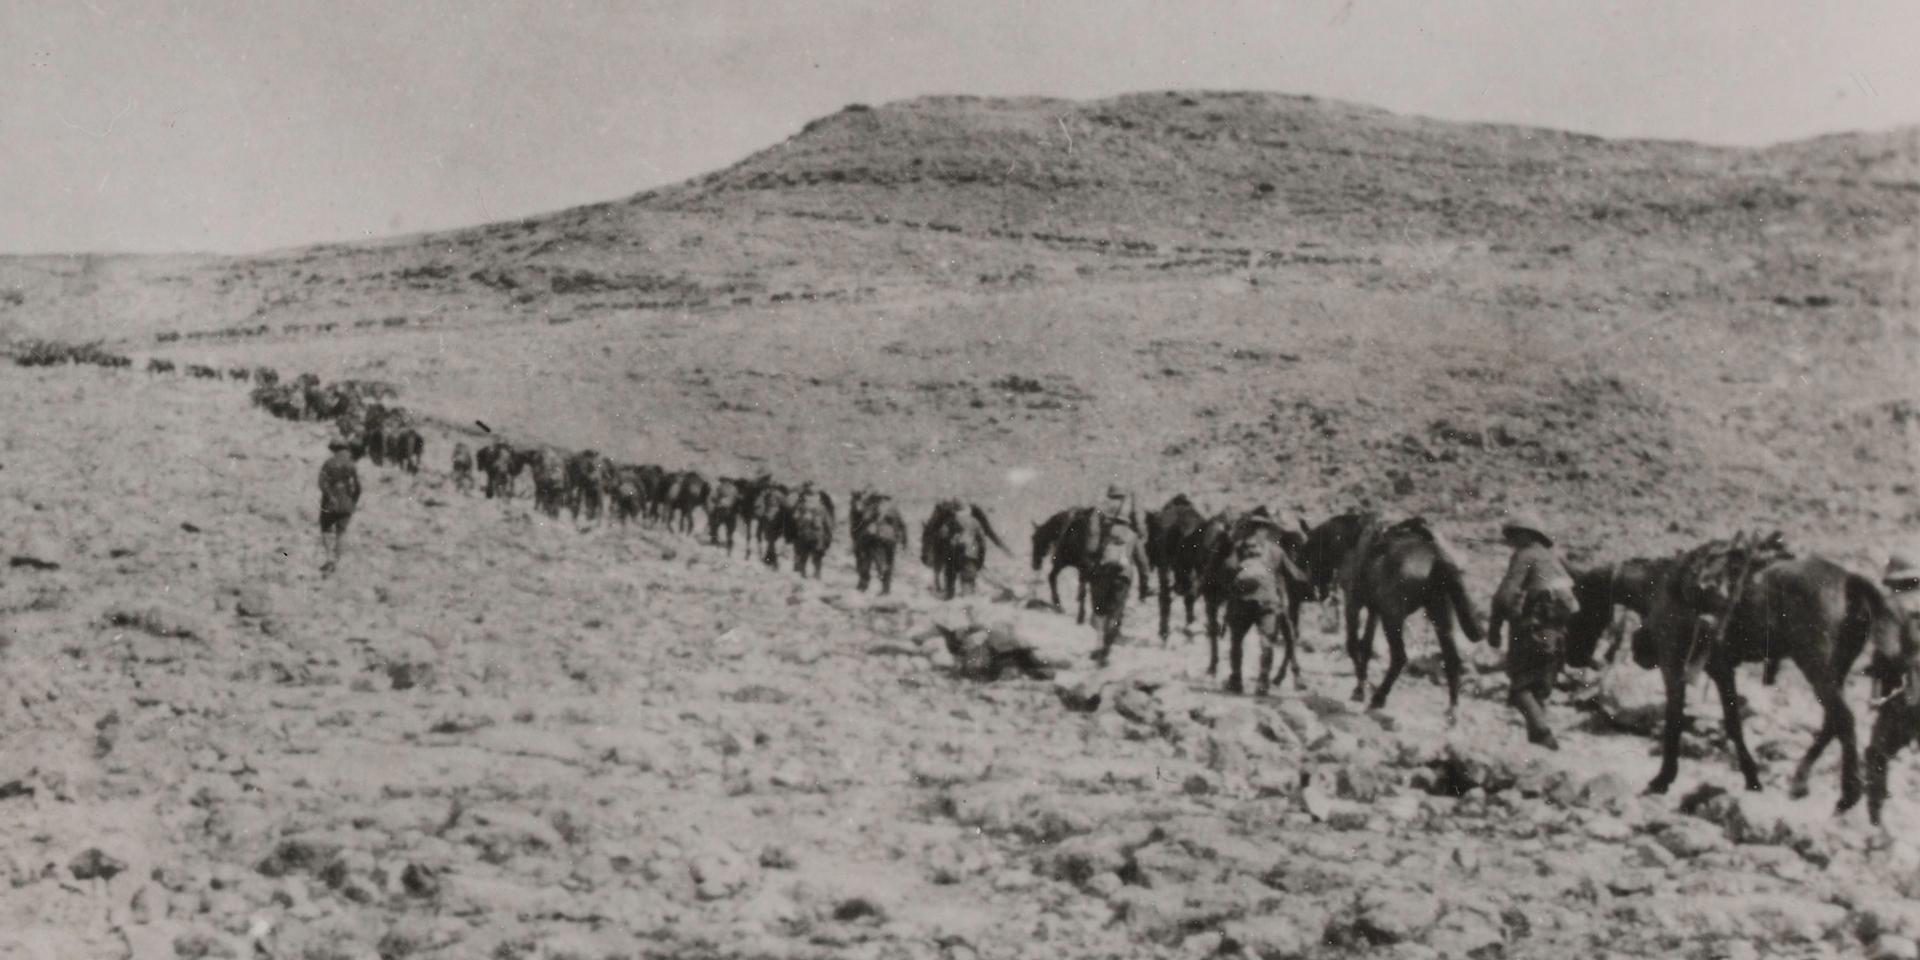 1/1st Buckinghamshire Yeomanry (Royal Bucks Hussars) on patrol, 1915